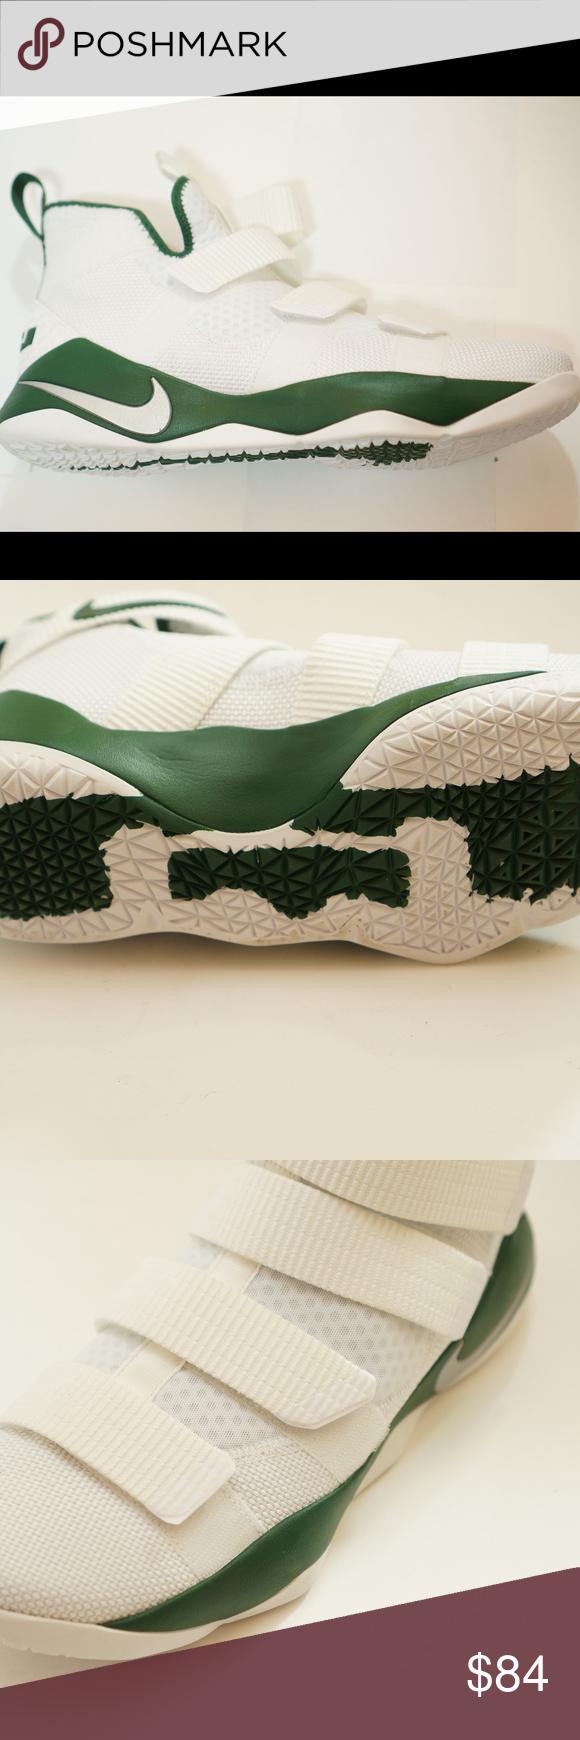 1ea0f7f10f29 🔥 Nike Lebron Soldier XI (11) TB Promo RARE White   BRAND SPANKIN ...